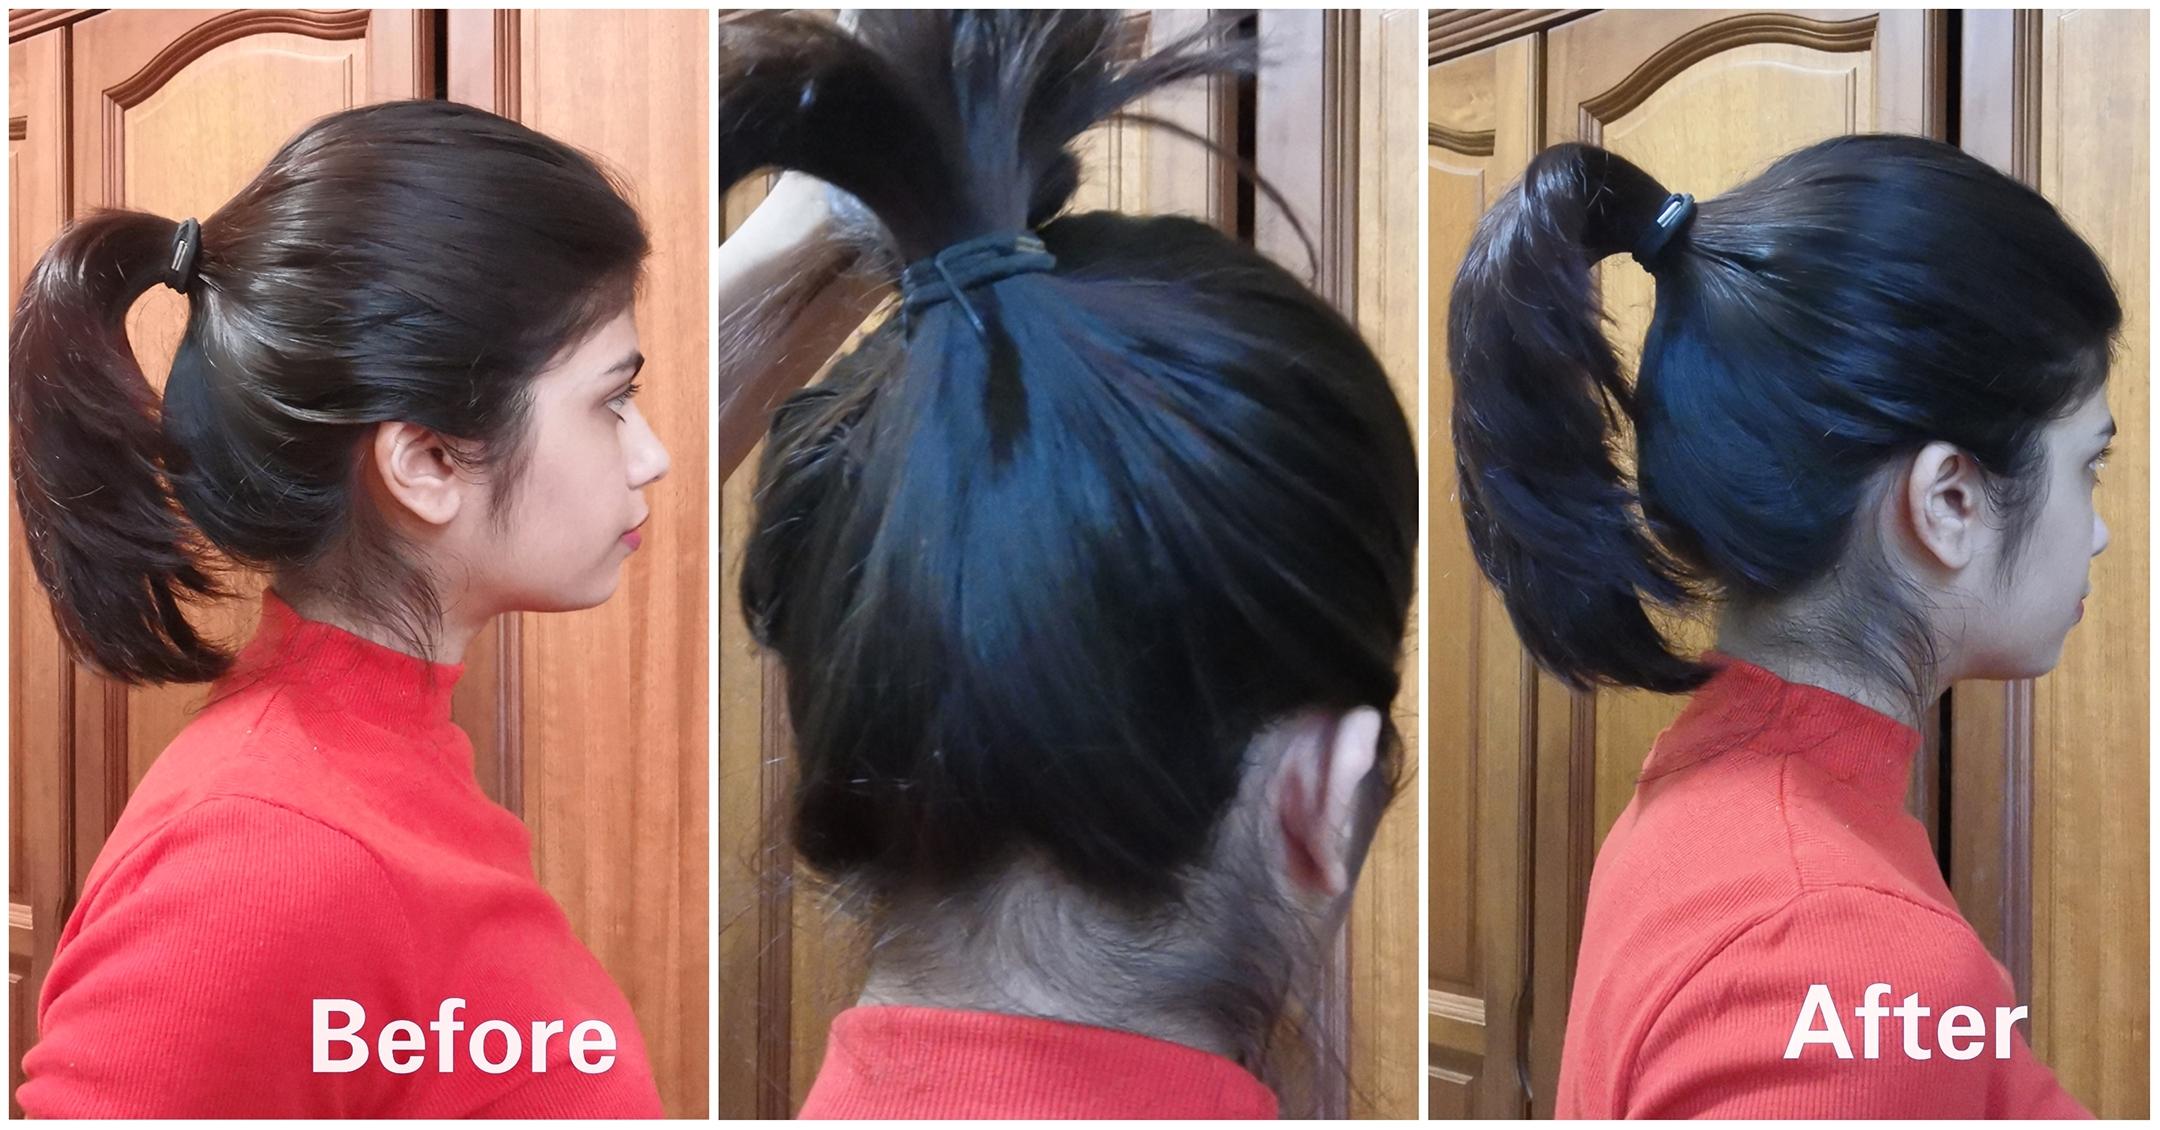 popular hair hacks tested_perky ponytails